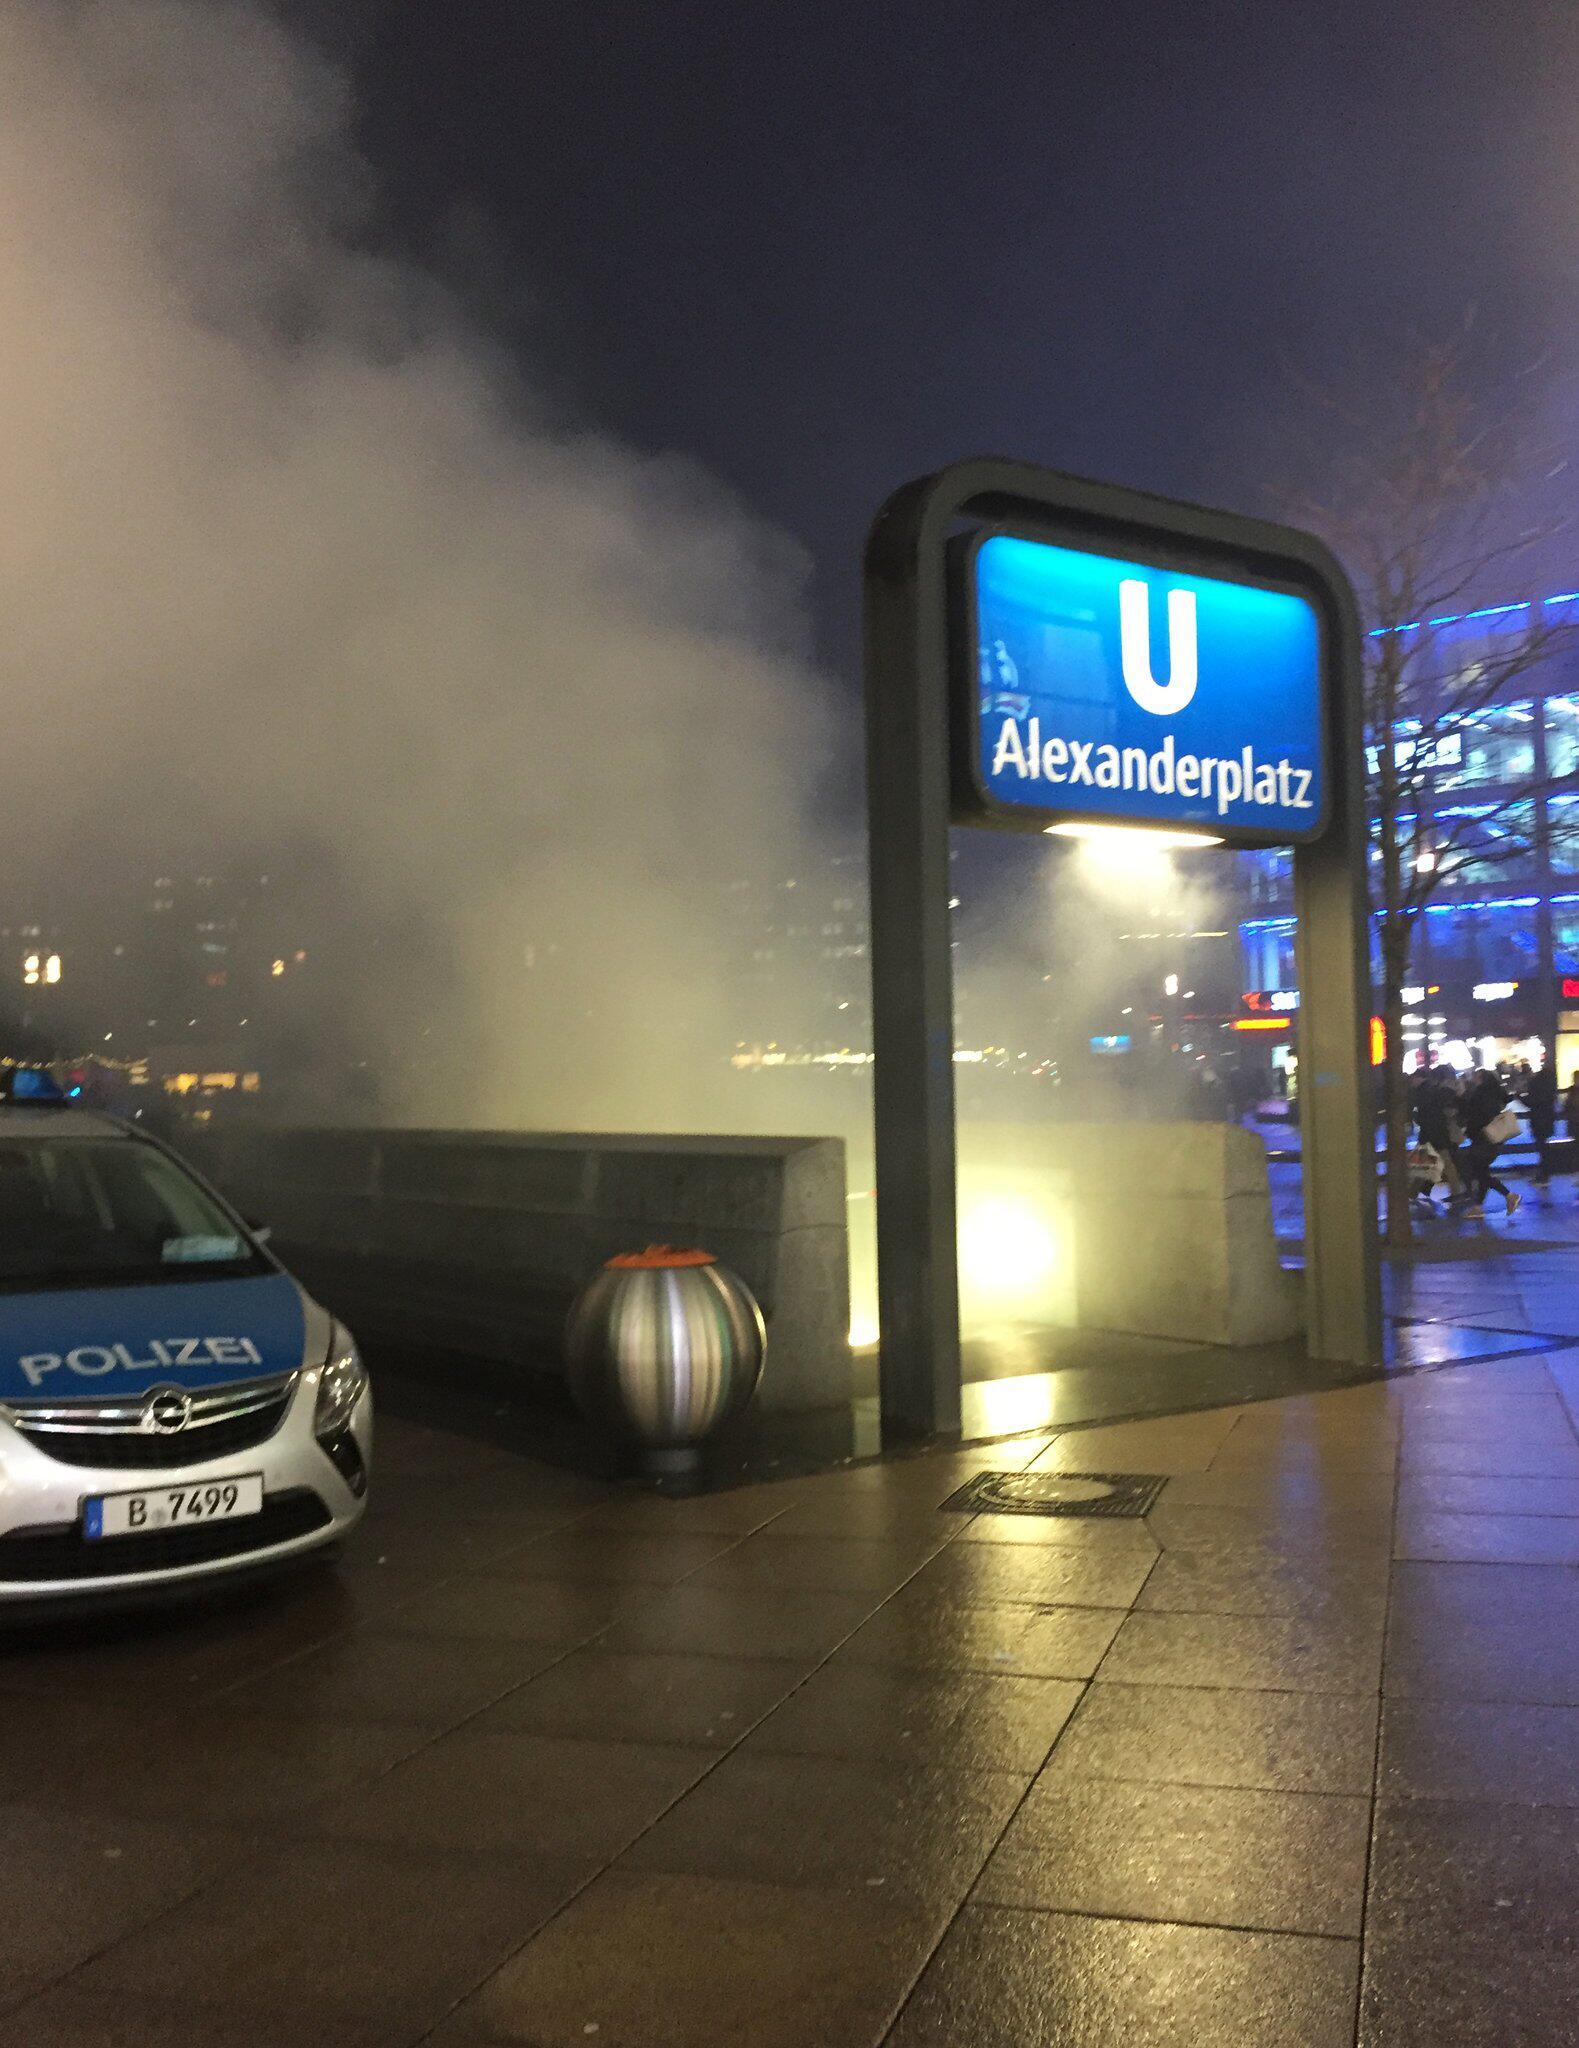 Bild zu Brand im U-Bahnhof Alexanderplatz